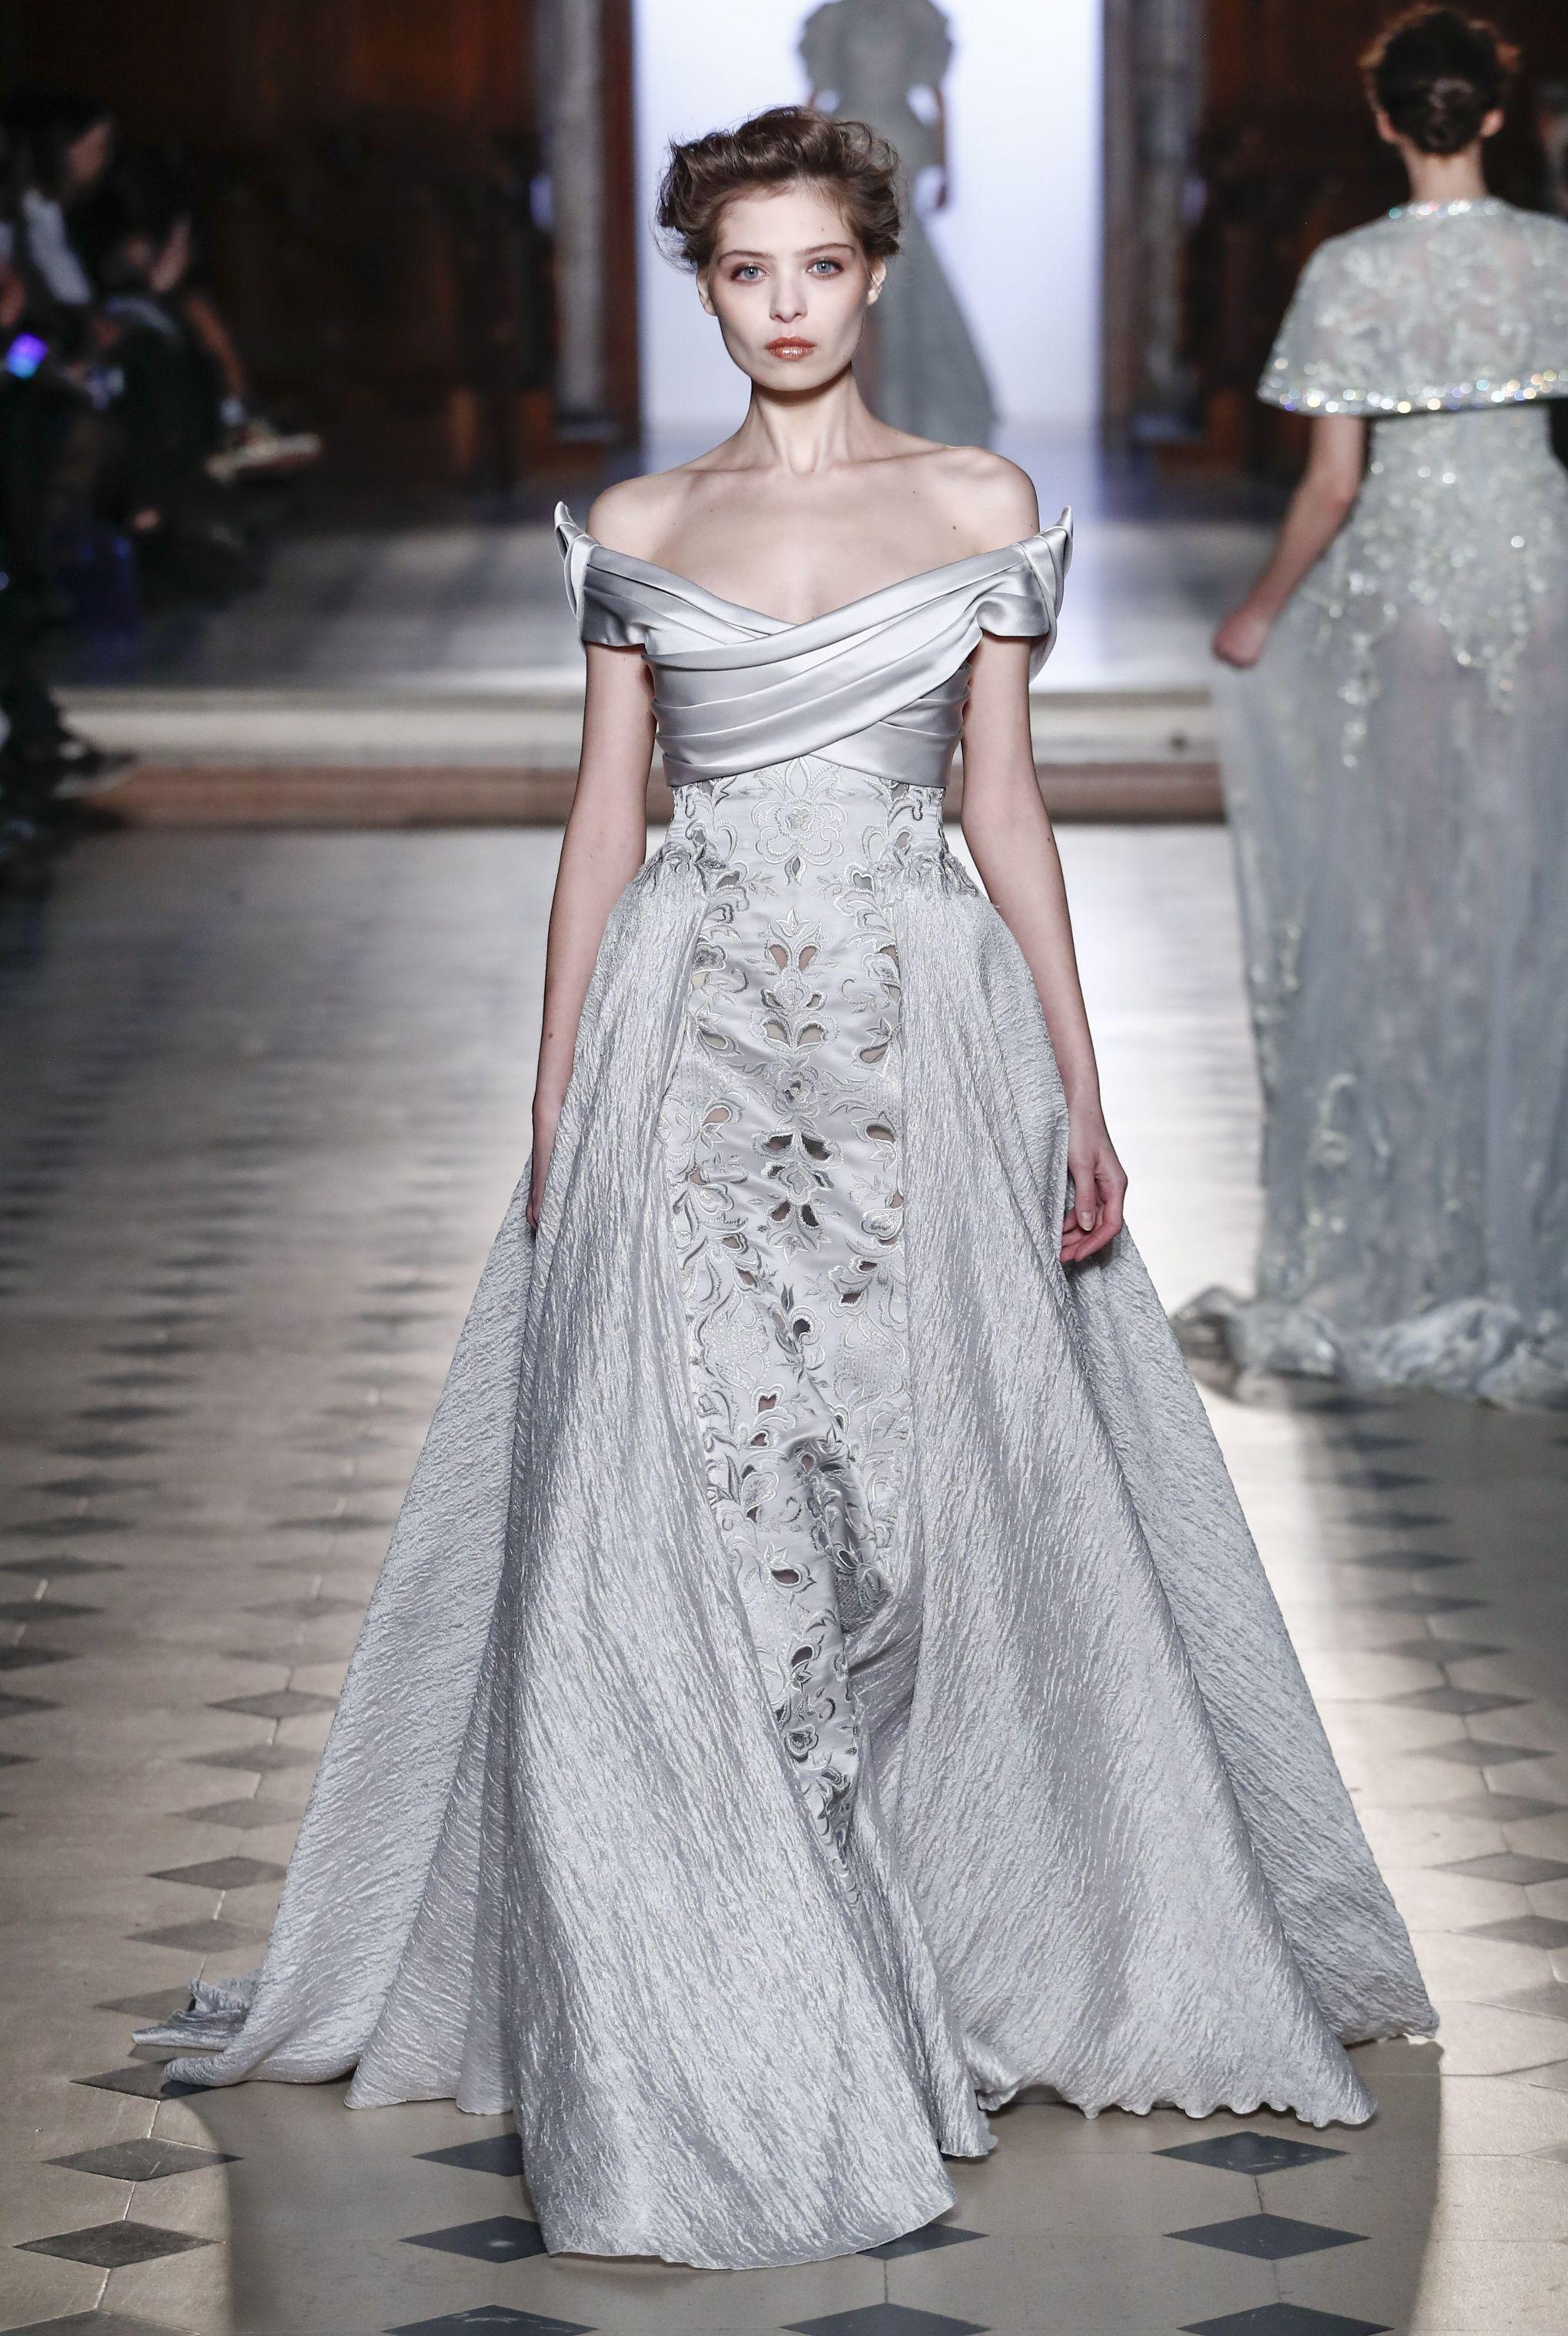 The Best Alternative Wedding Dresses | Tony ward wedding dresses ...